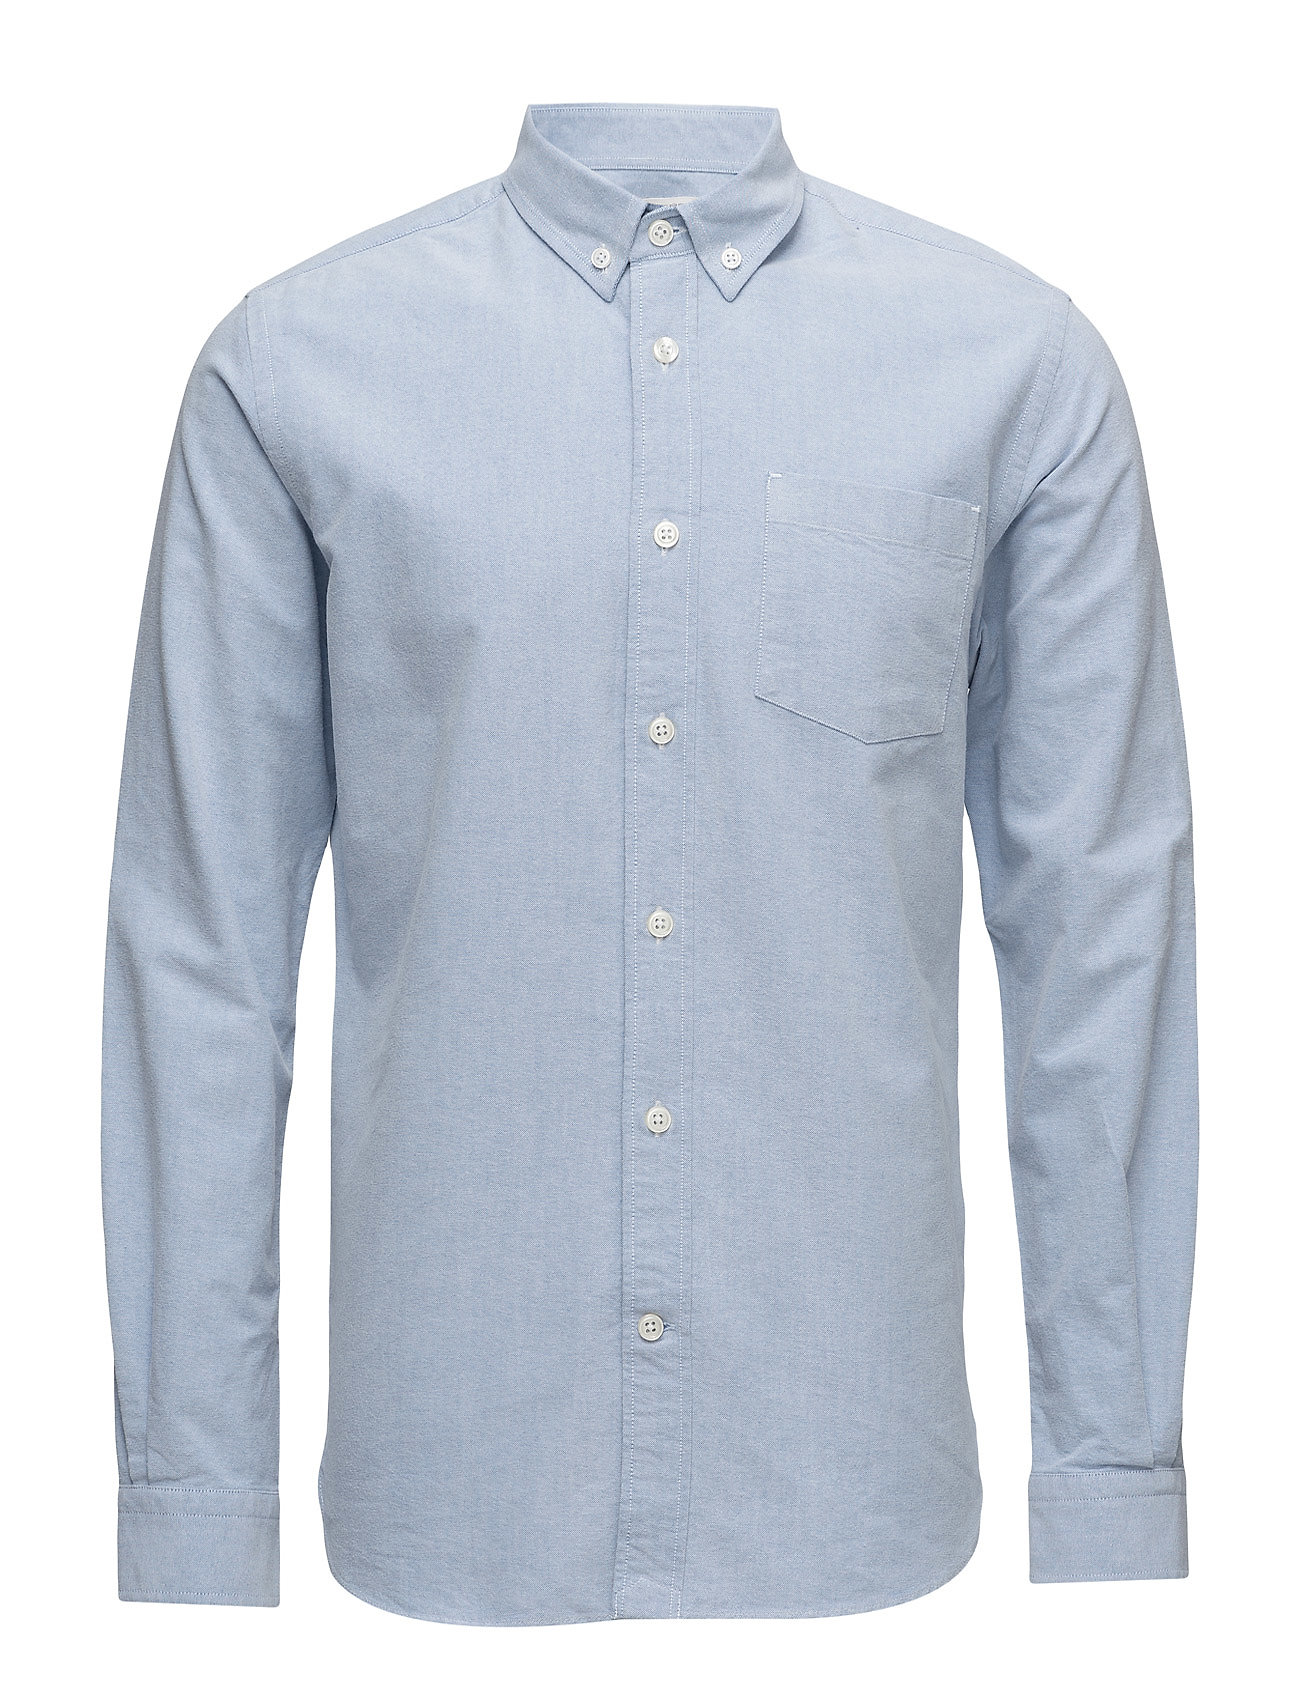 Knowledge Cotton Apparel Button Down Oxford Shirt - GOTS/Veg - LIMOGES